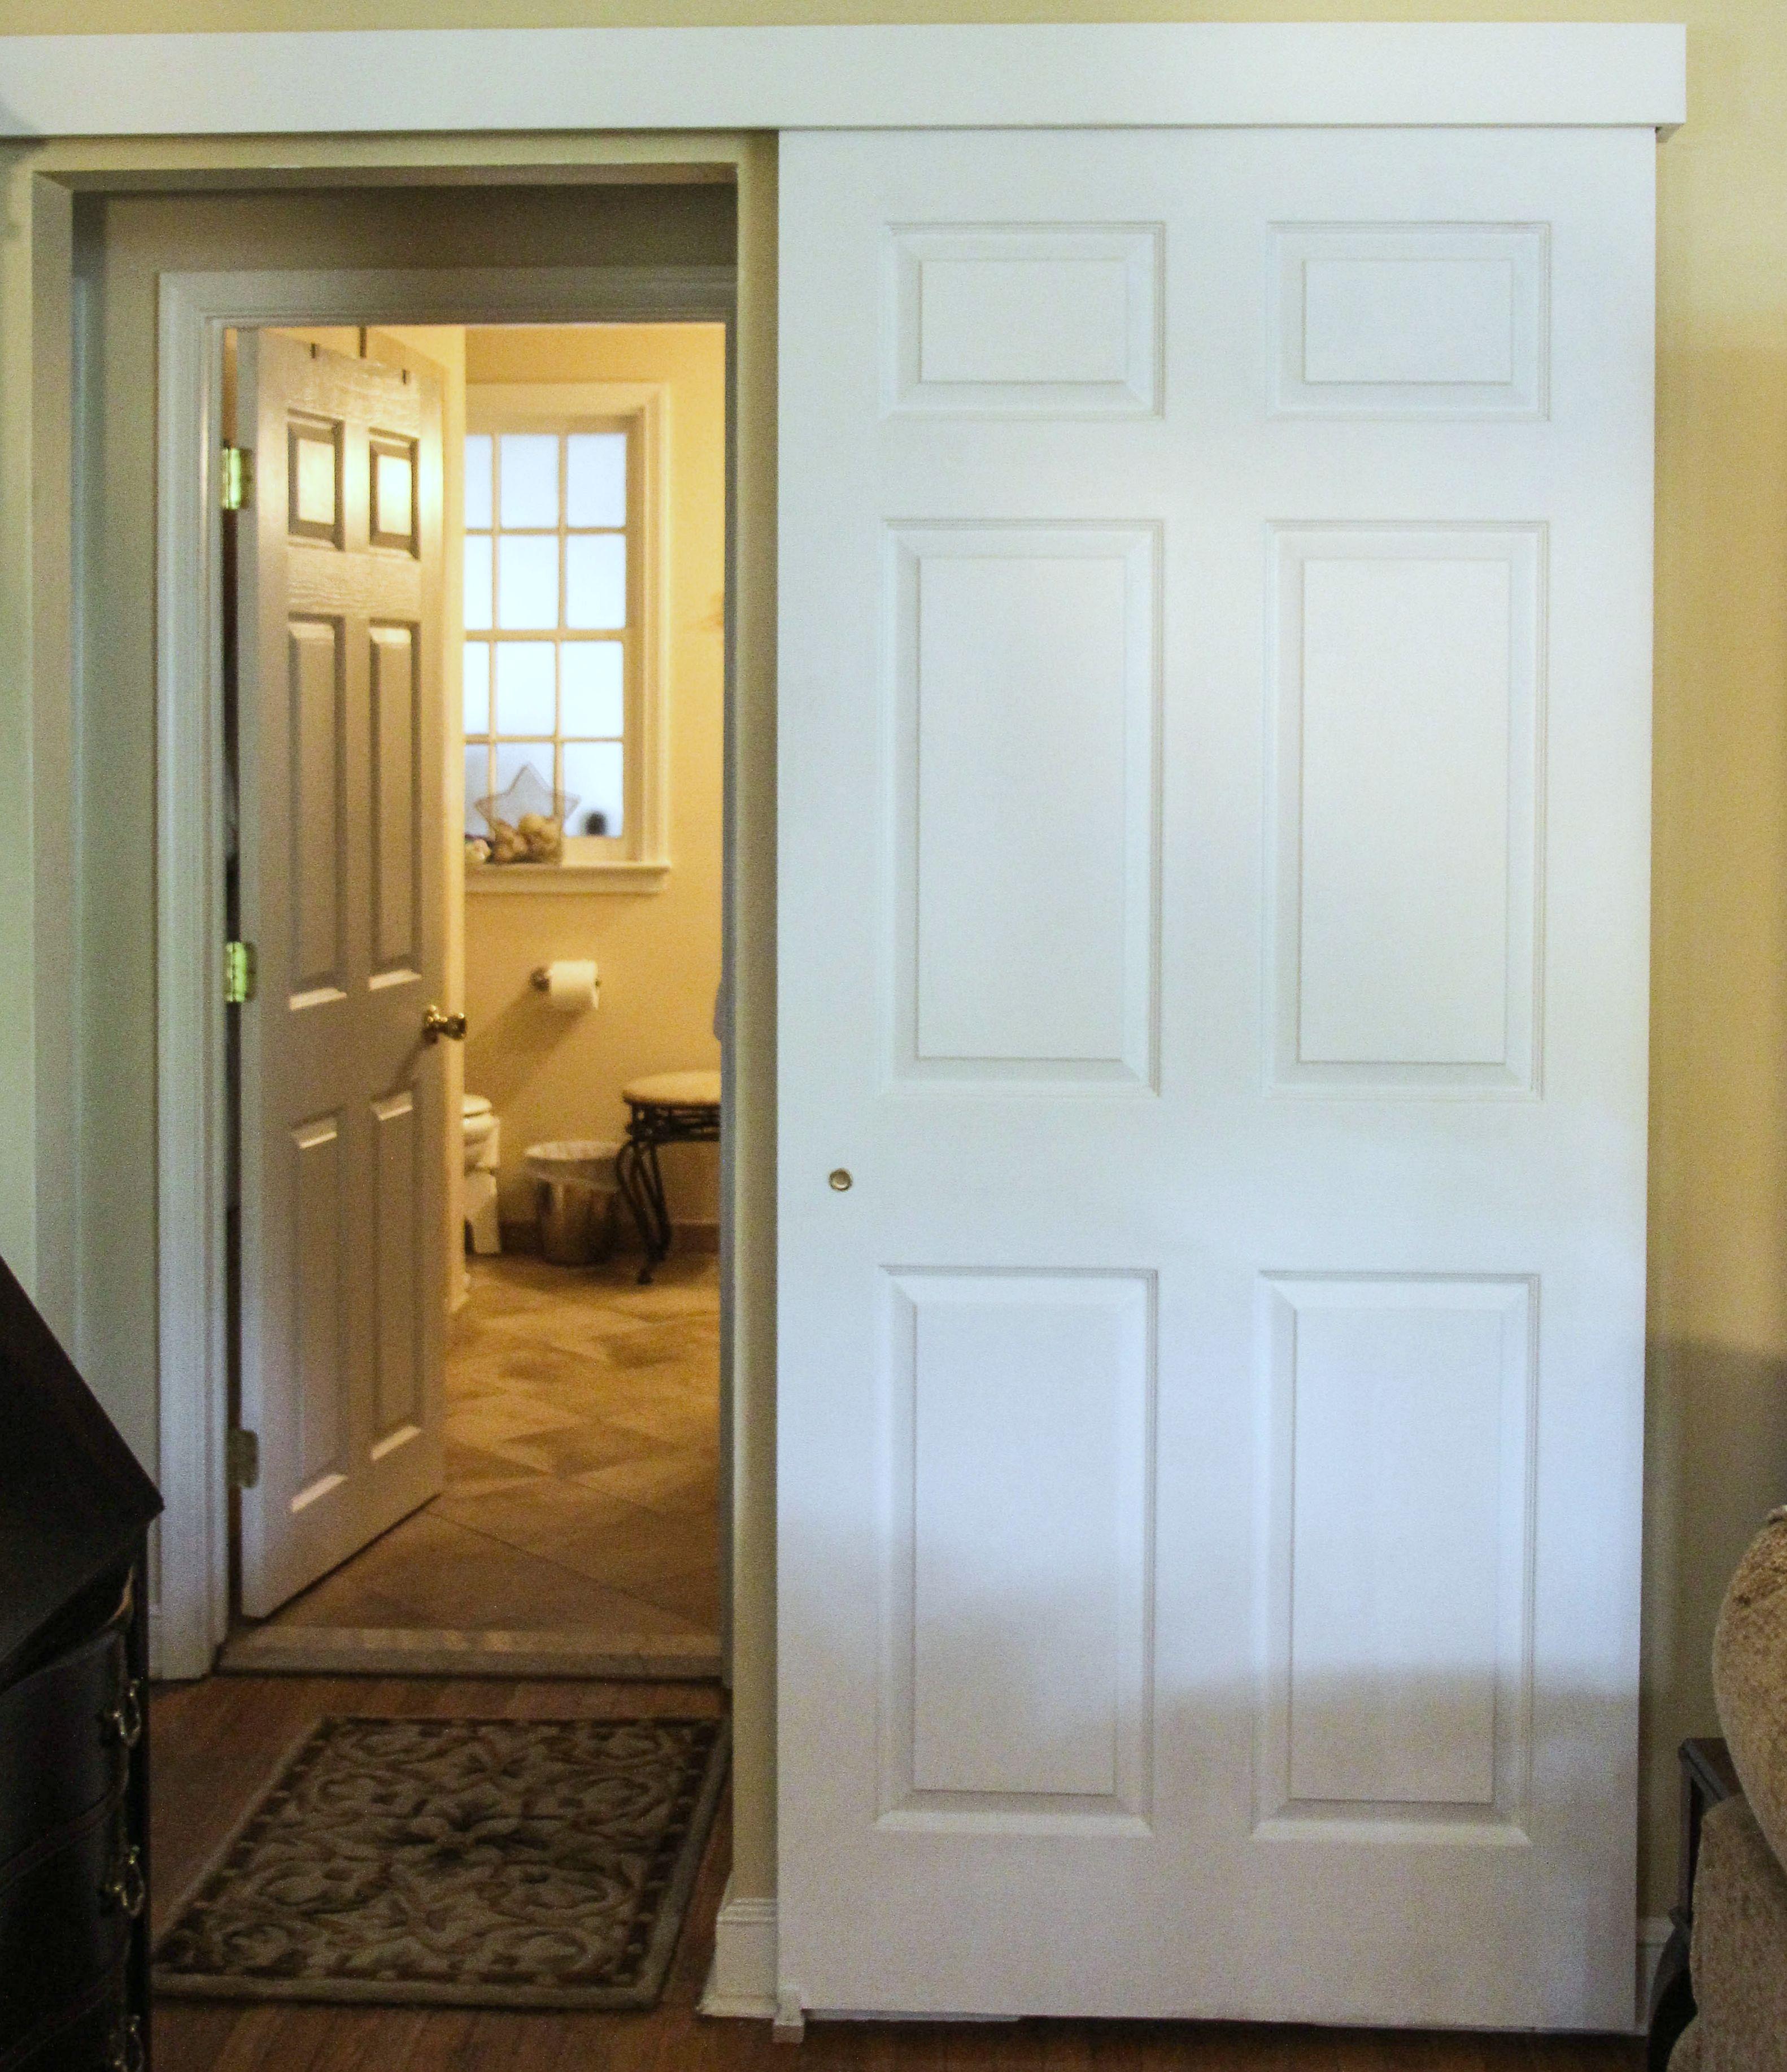 External Pocket Door For The Home Pinterest Pocket